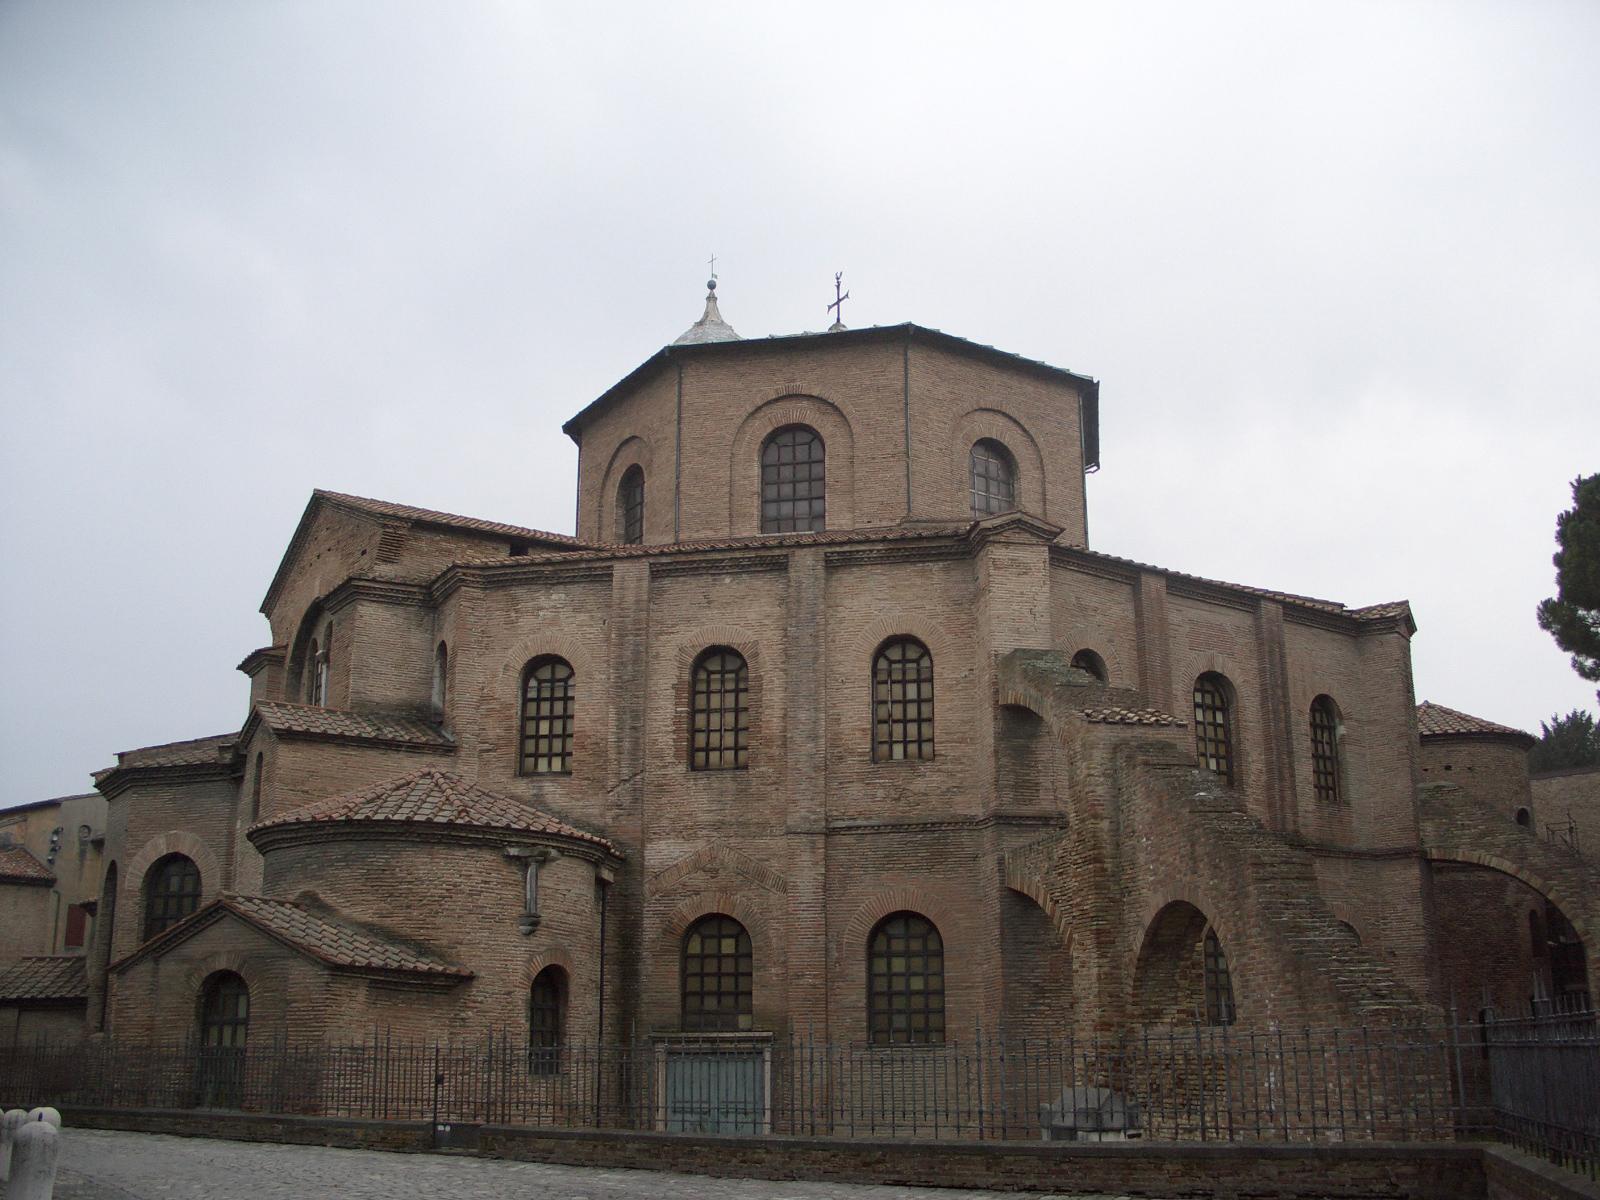 Basilica of San Vitale in Ravenna, Italy.